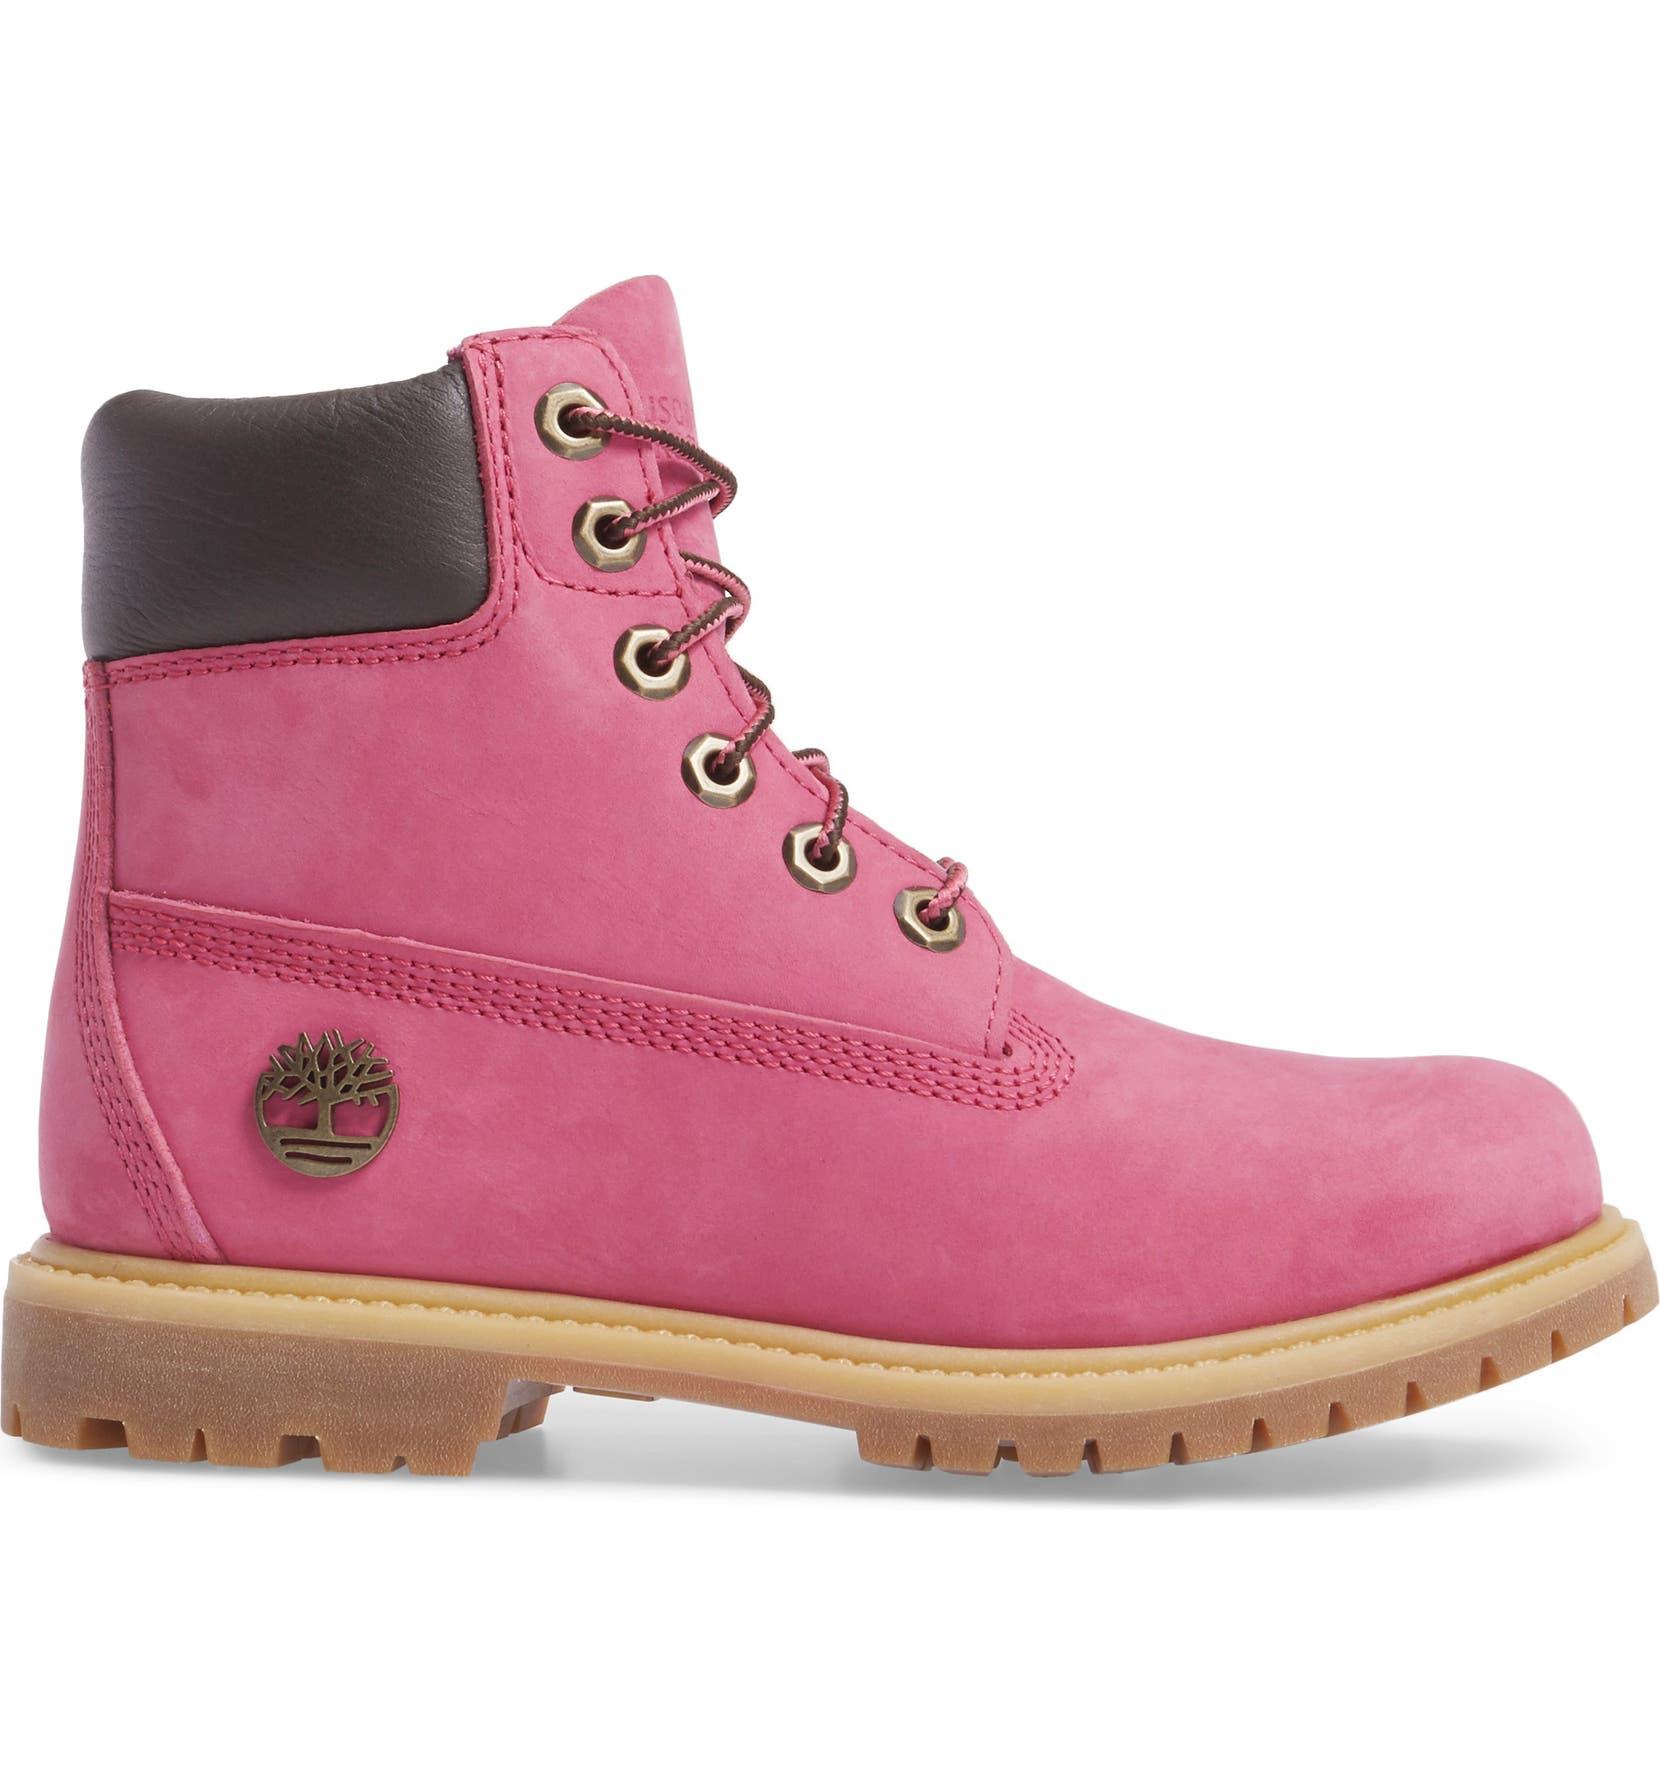 Timberland x Susan G. Komen Foundation Hot Pink 6 Inch Boot